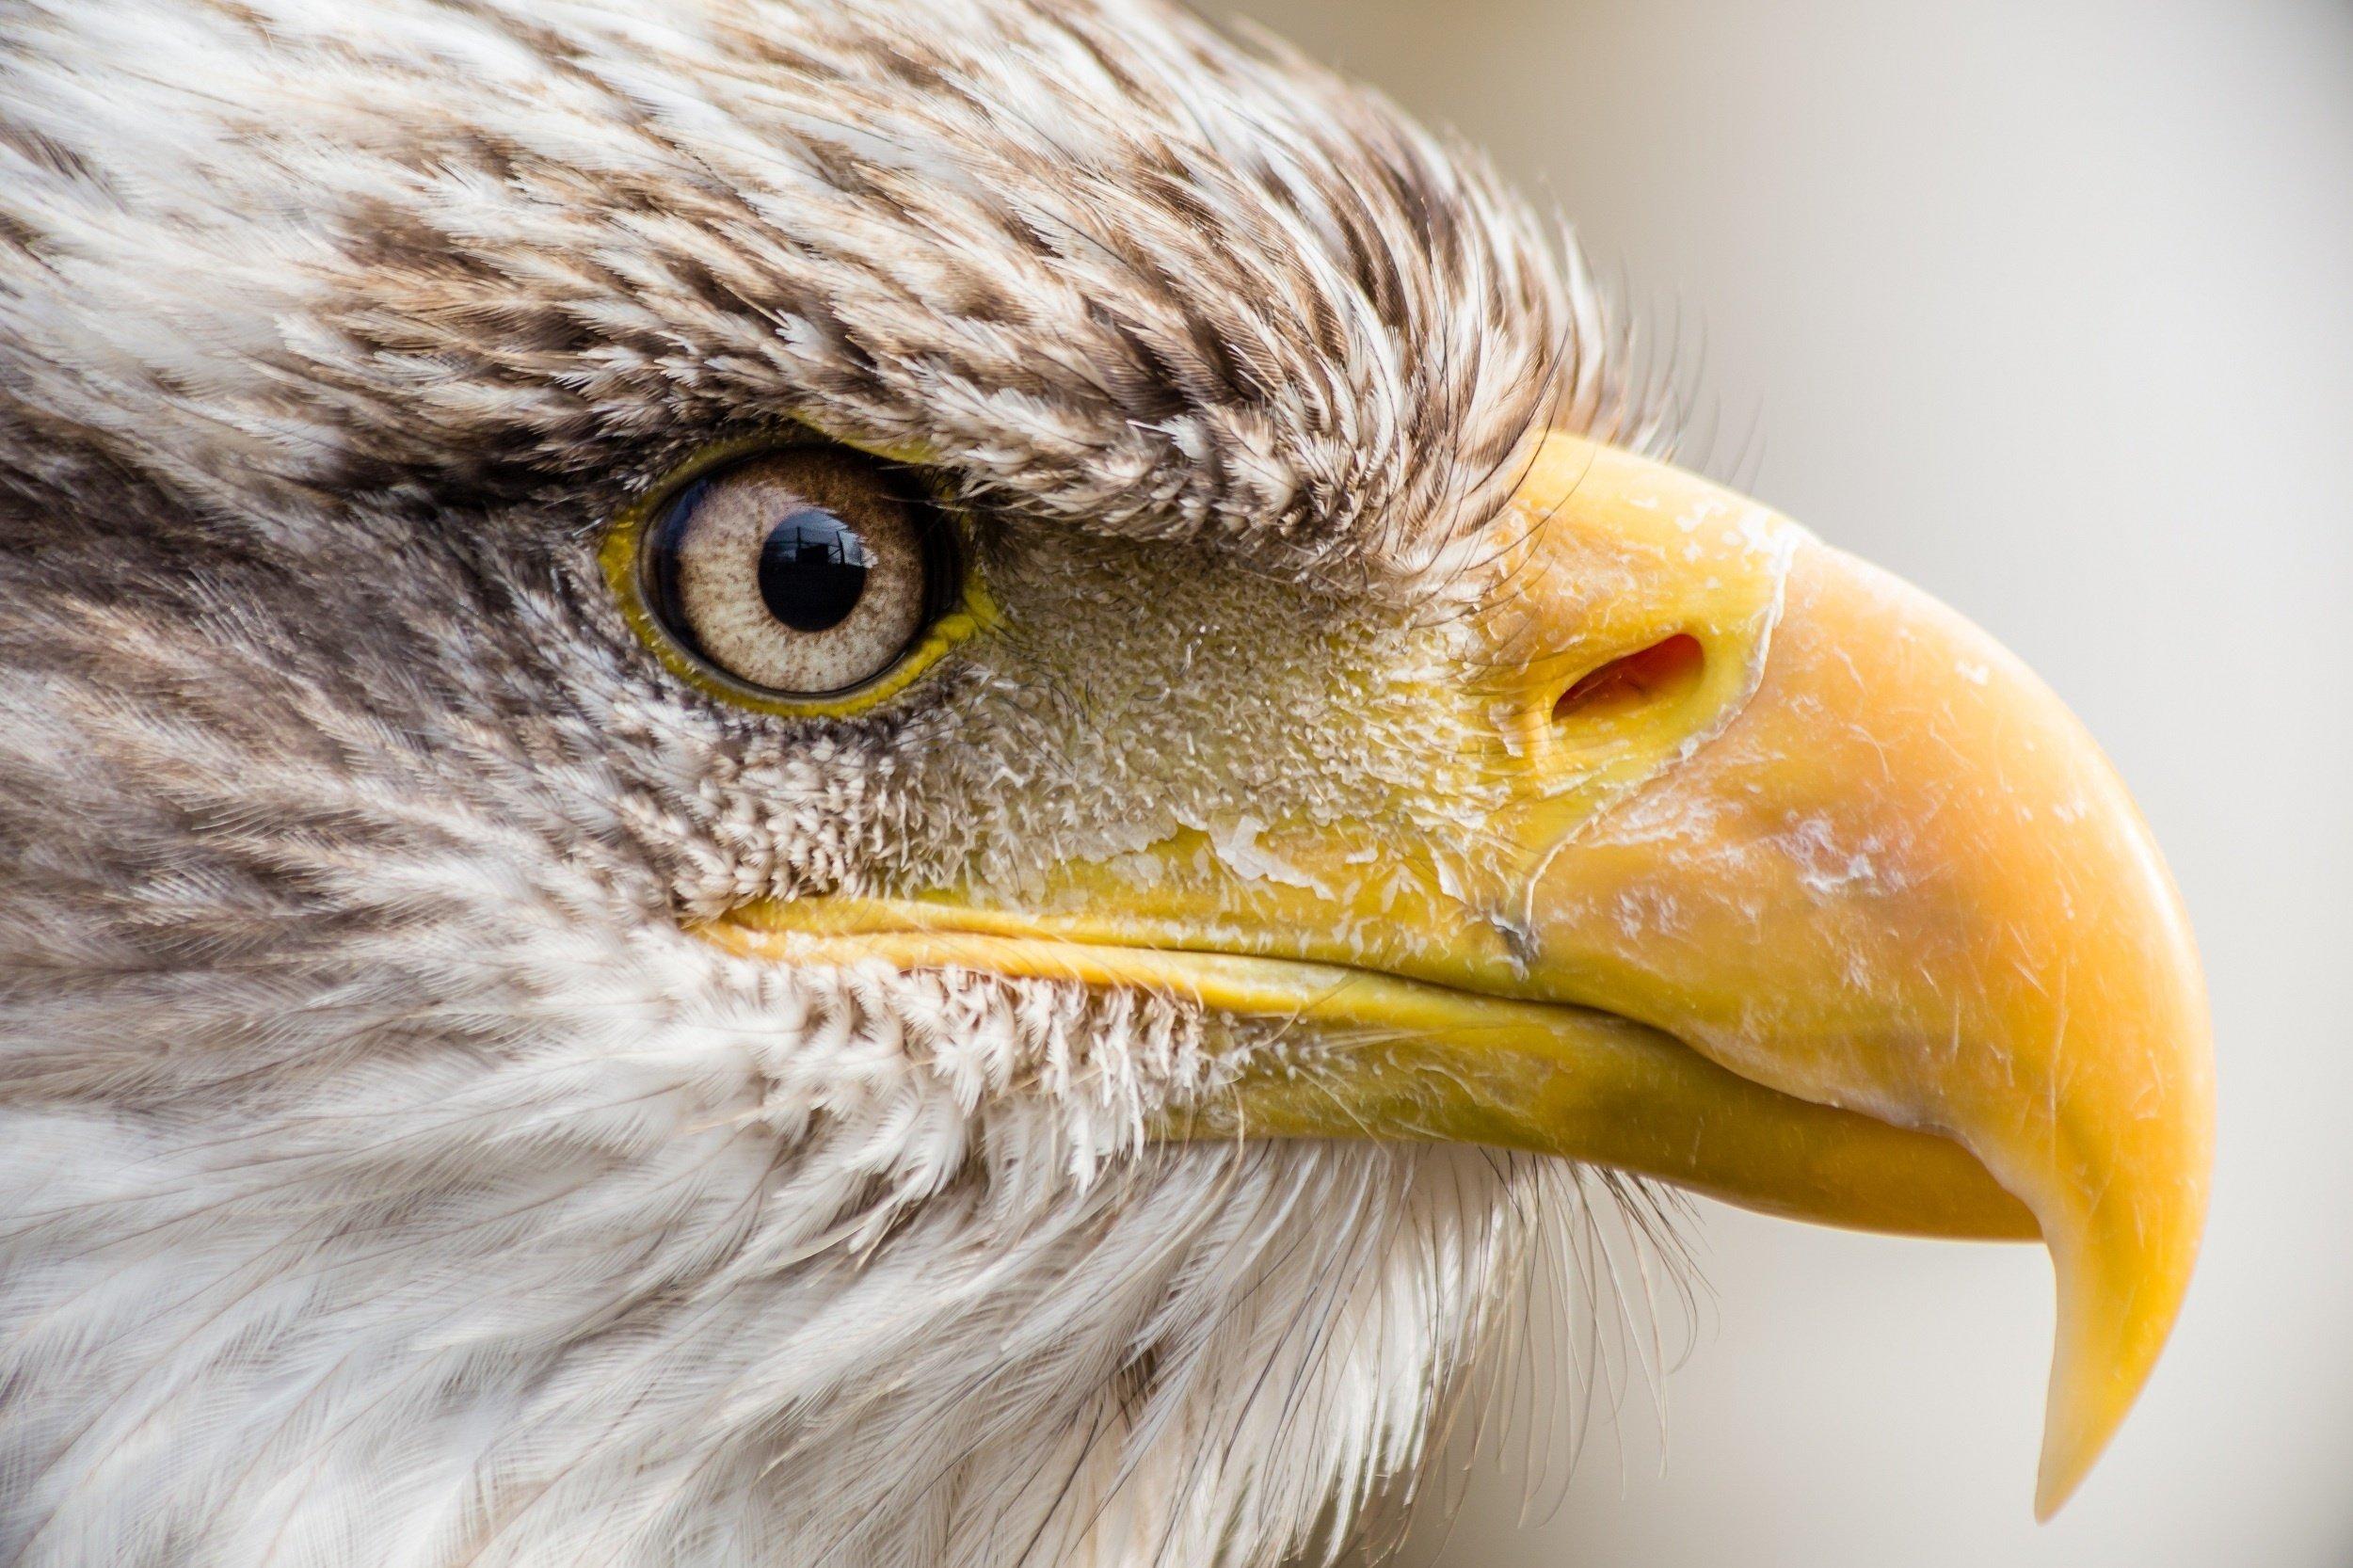 Eagle beak - photo#34